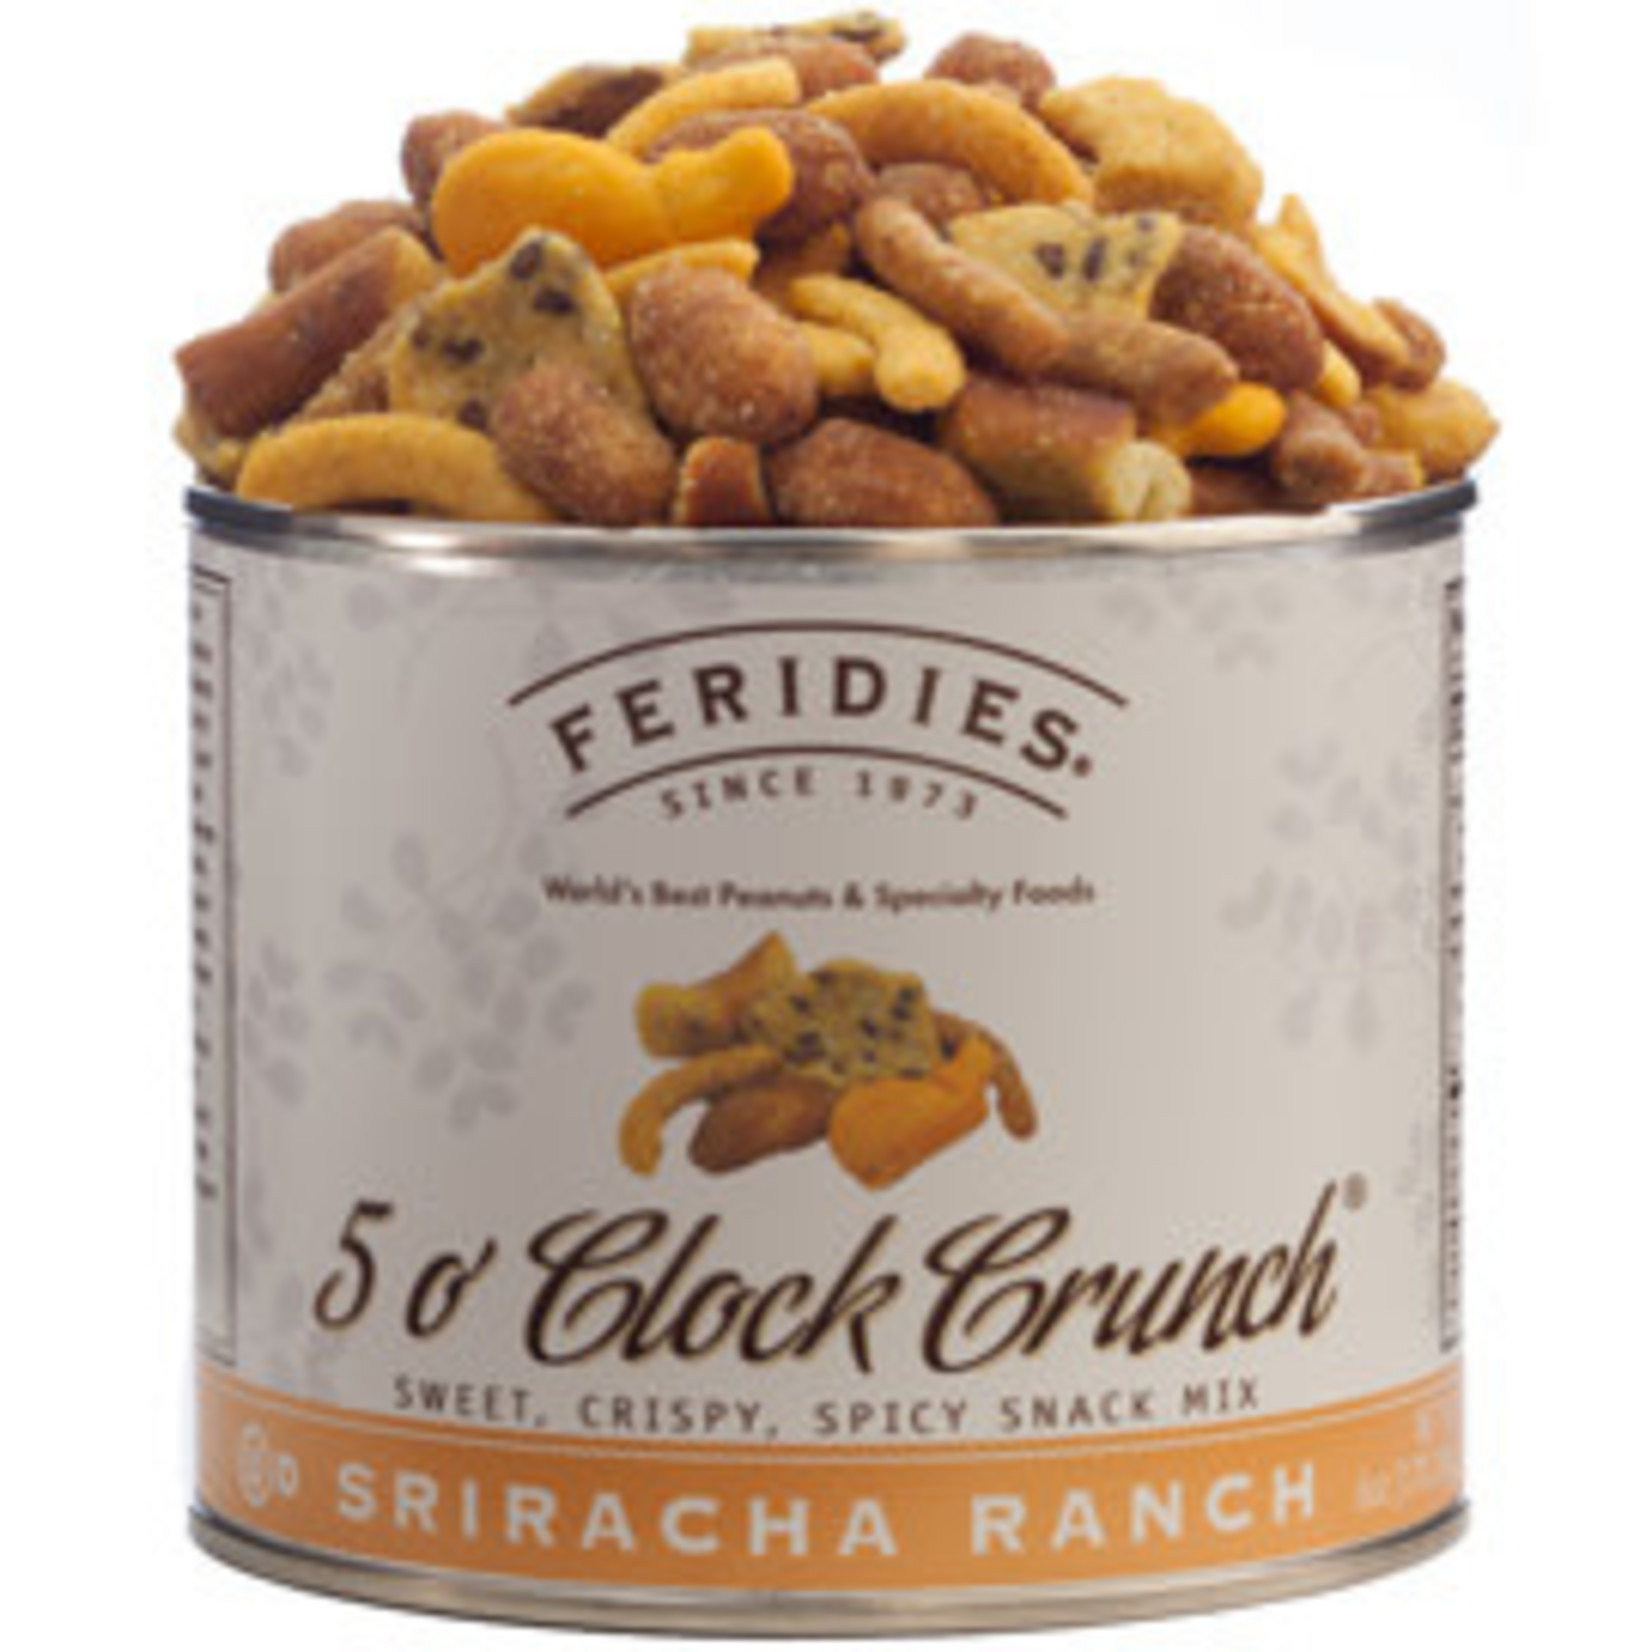 Feridies Peanuts & Specialty Foods FERIDIES PEANUTS & SPECIALTY FOODS •